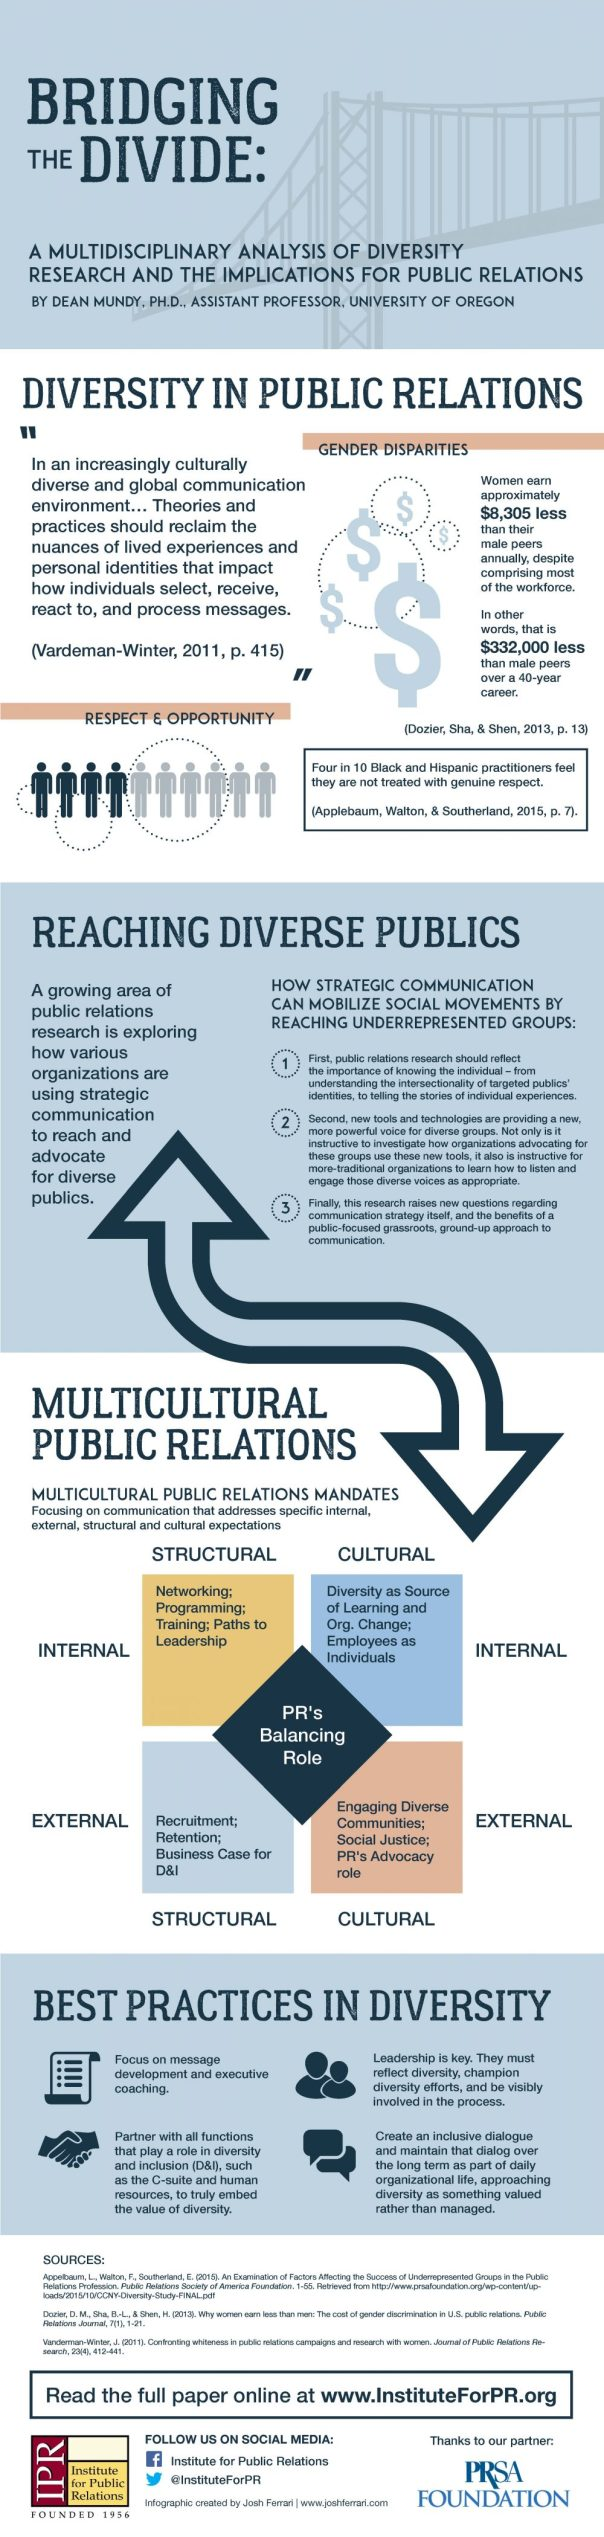 Diversity-Dean-Mundy-IPR-Infographic(1)